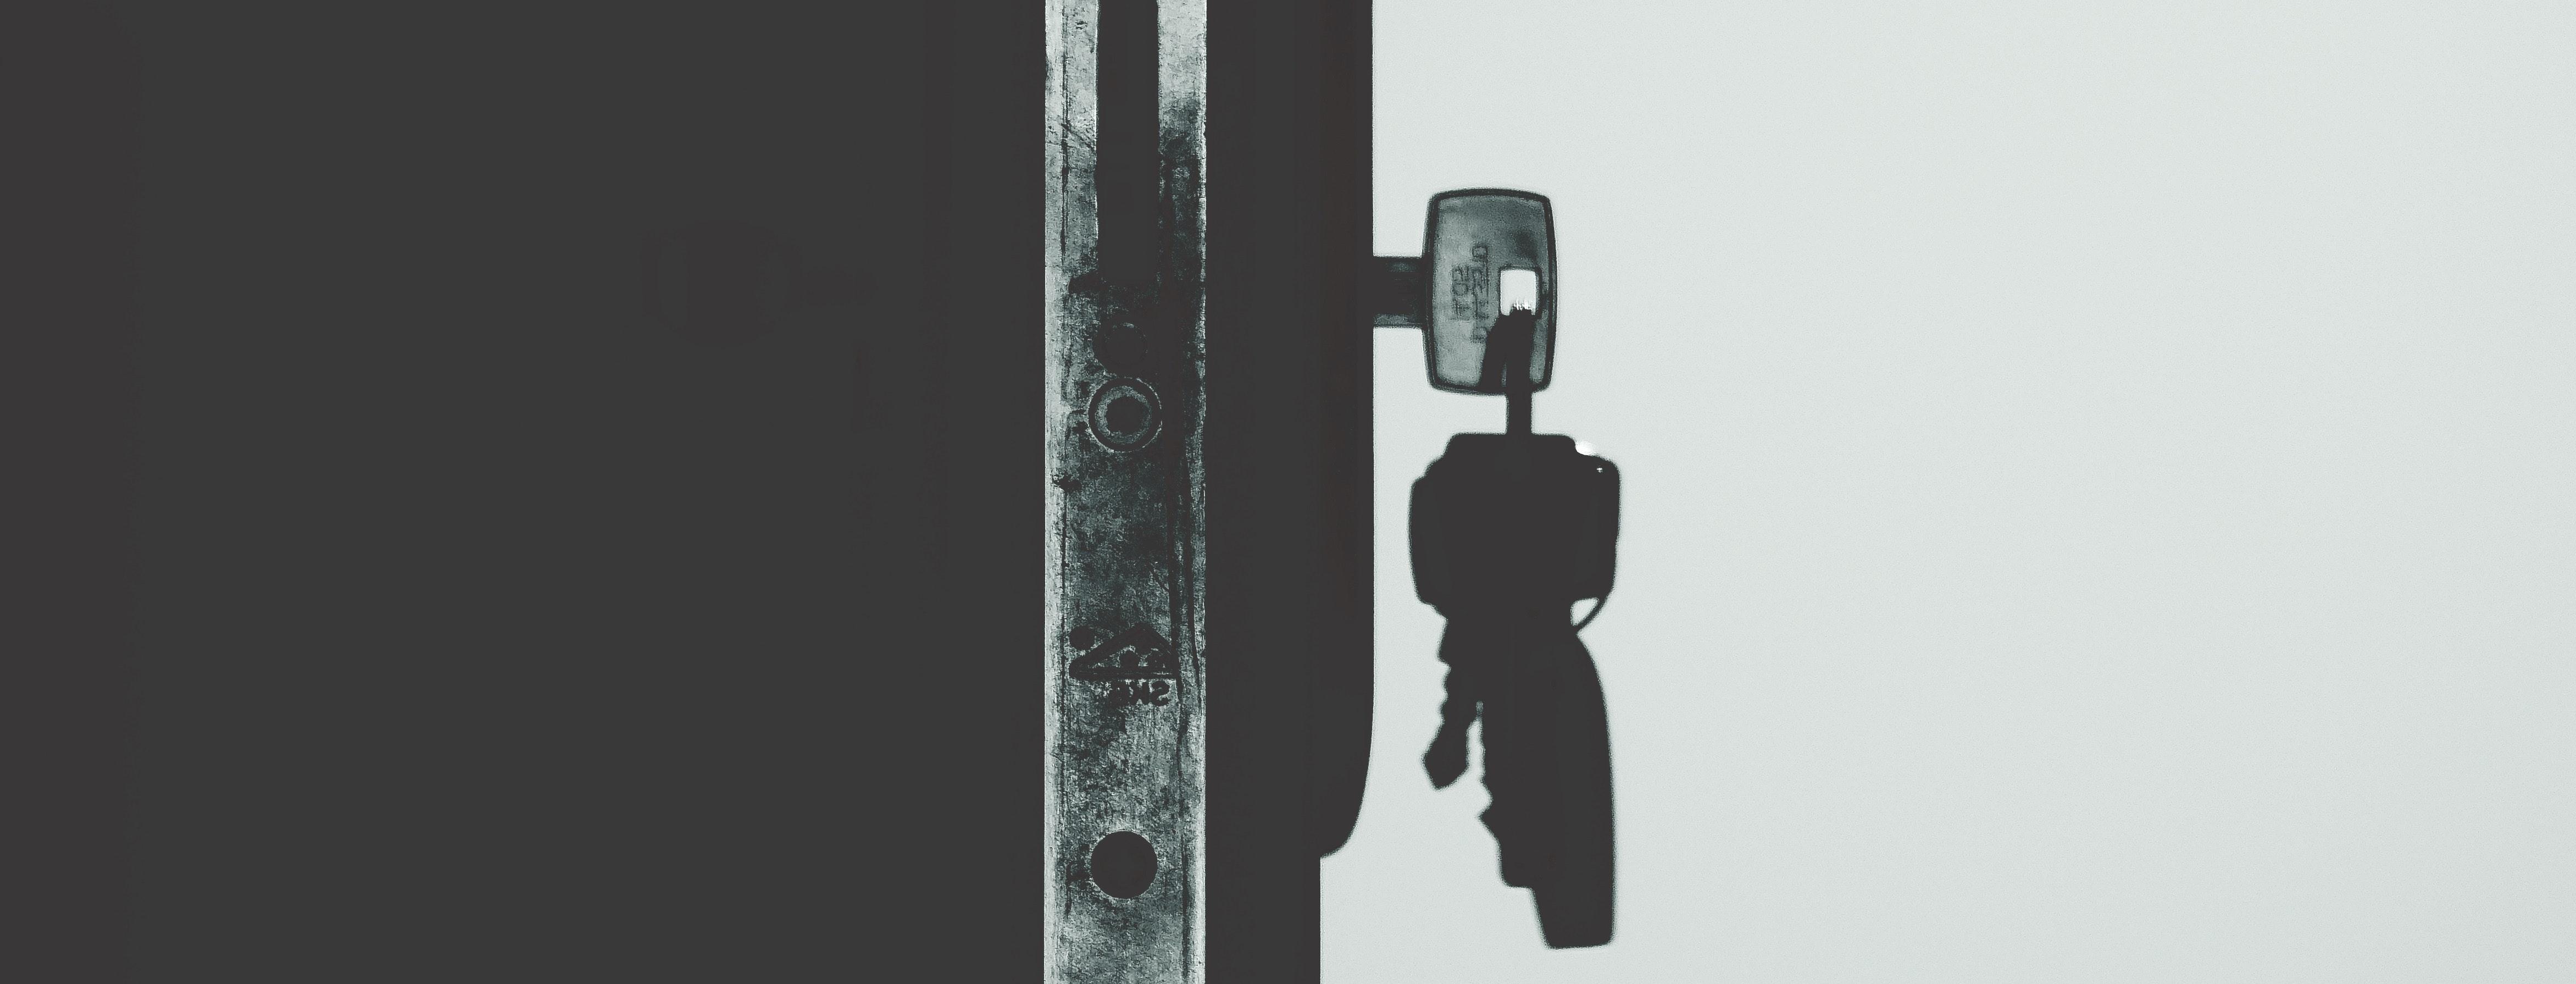 black house key. Related Searches: House Keys Key Car Home Black